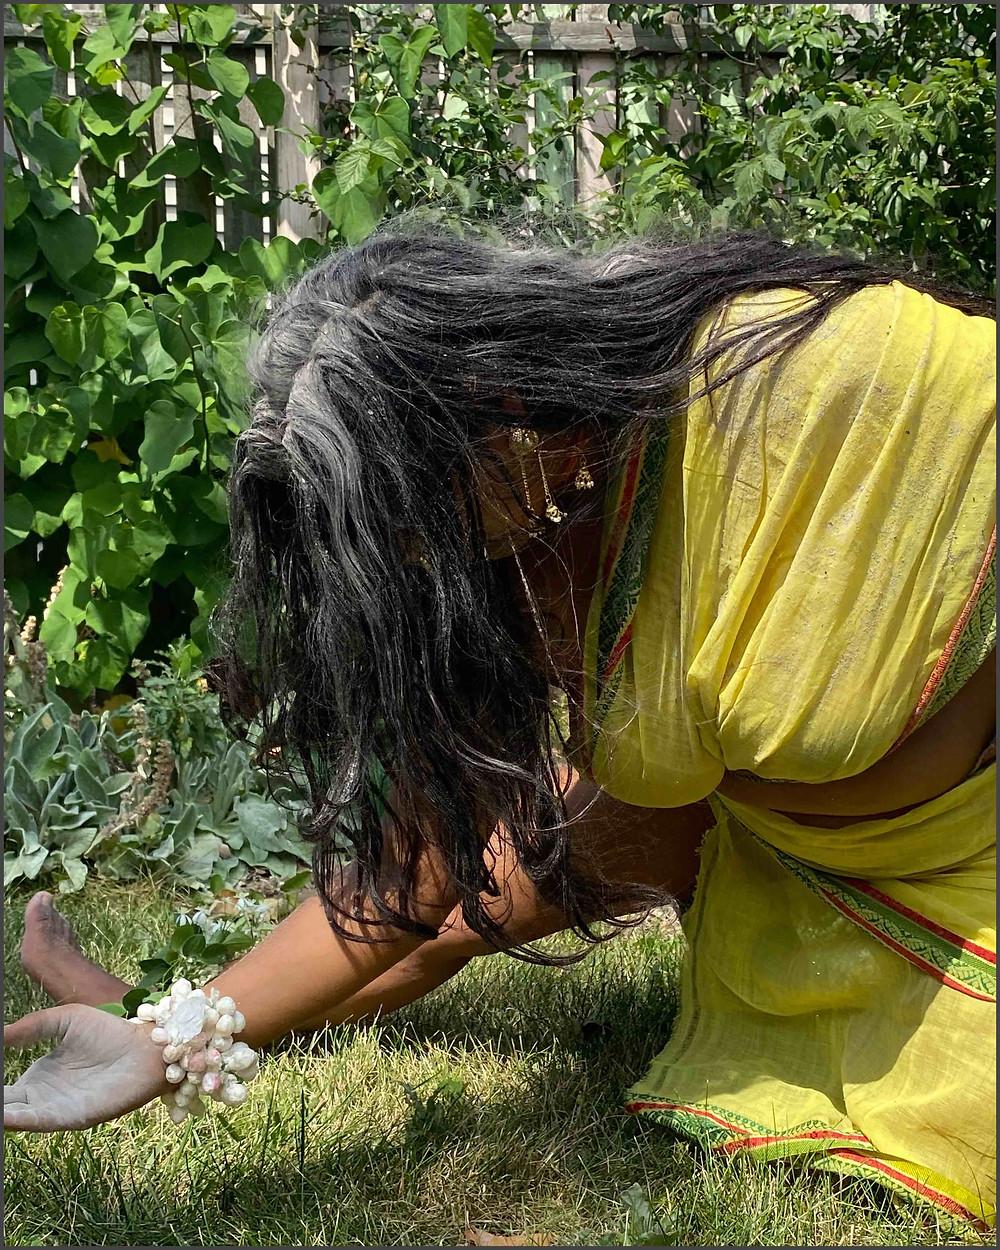 Meditate on Valli, her body, her murti, her form. Meditate on Vallli, she transcends her body, her murti, her form. Your Guruji nearby. Gurudeva Beyond. Valli of Vallimanalan forms iccha sakti. Valli of Vallimanalan transcends iccha sakti.      Aum Sundaram Aumkaar Sundaram     Photographer: Alexa Rush on Instagram @alexadrawaflower